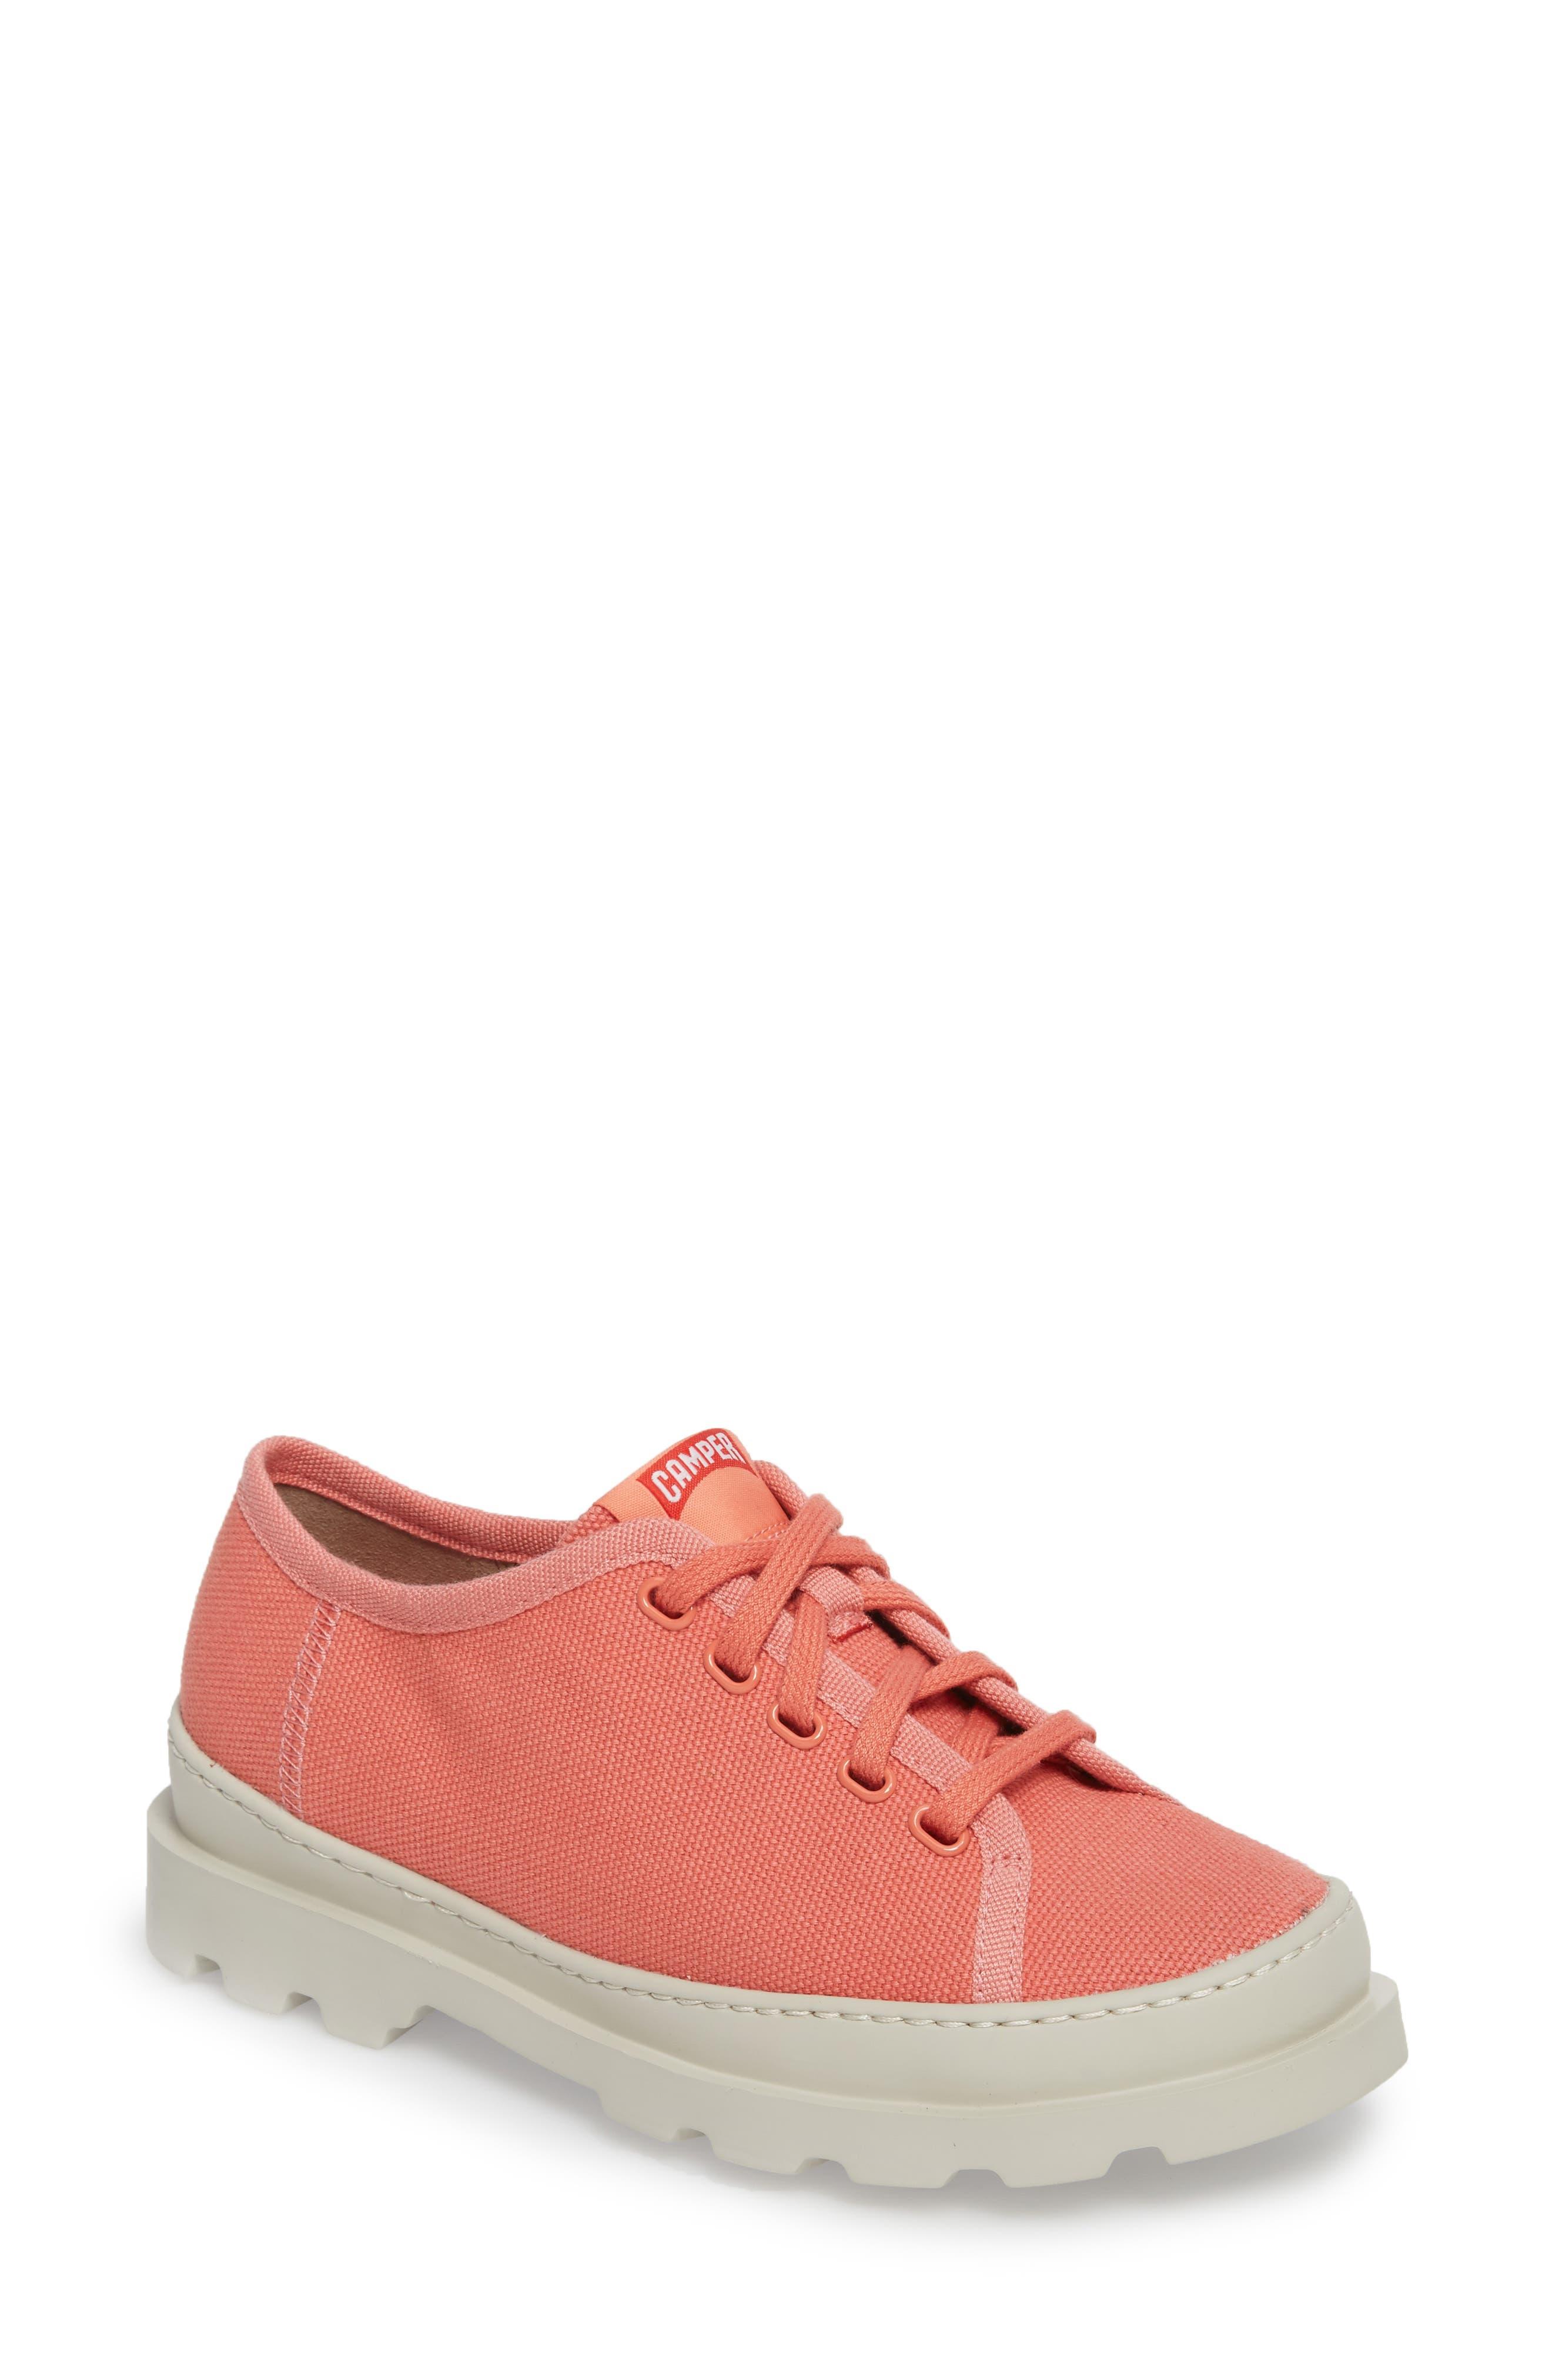 Brutus Lugged Platform Sneaker,                         Main,                         color, Pink